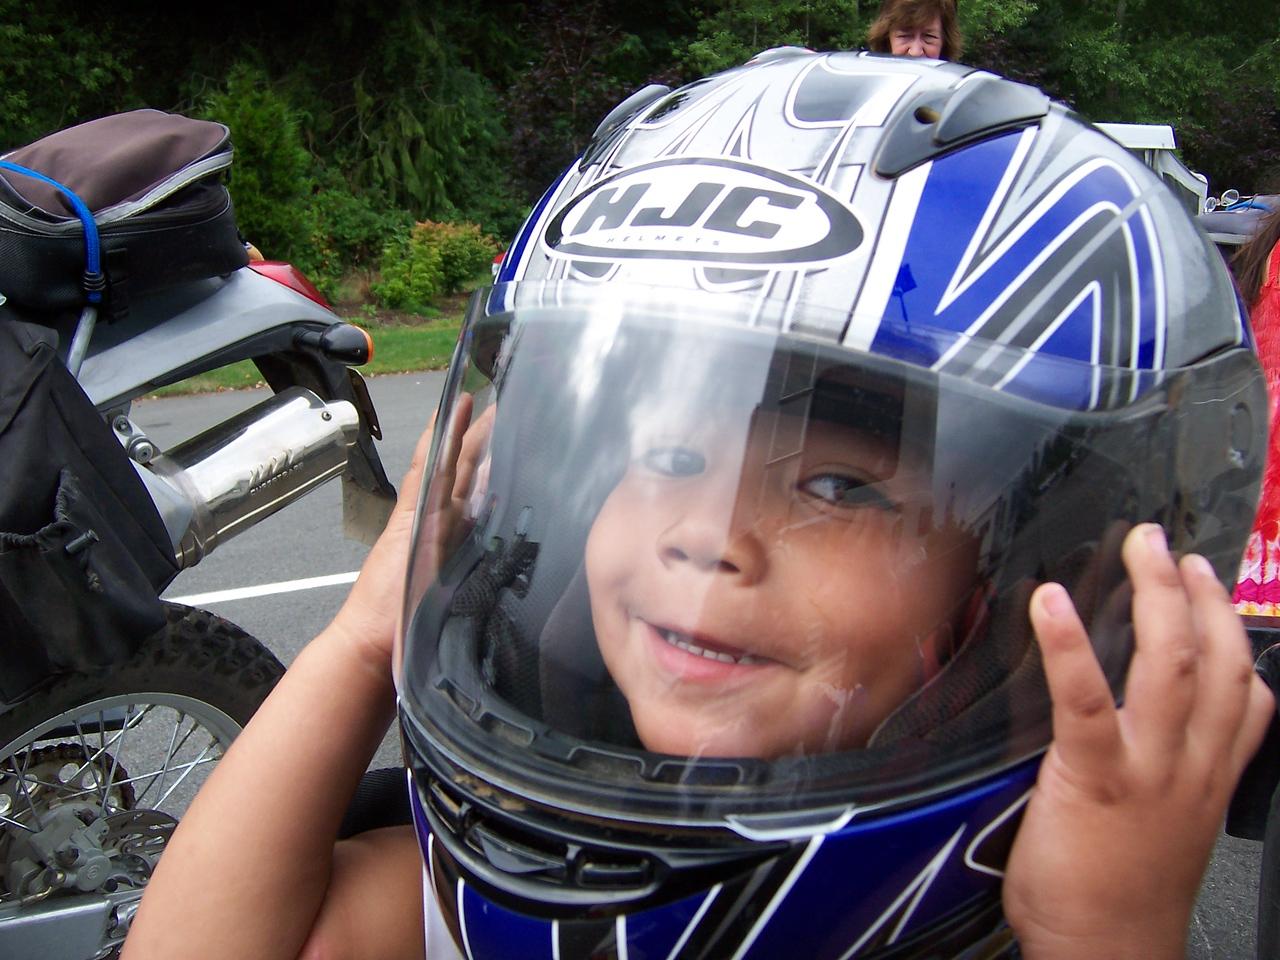 Future Dual Sport rider.